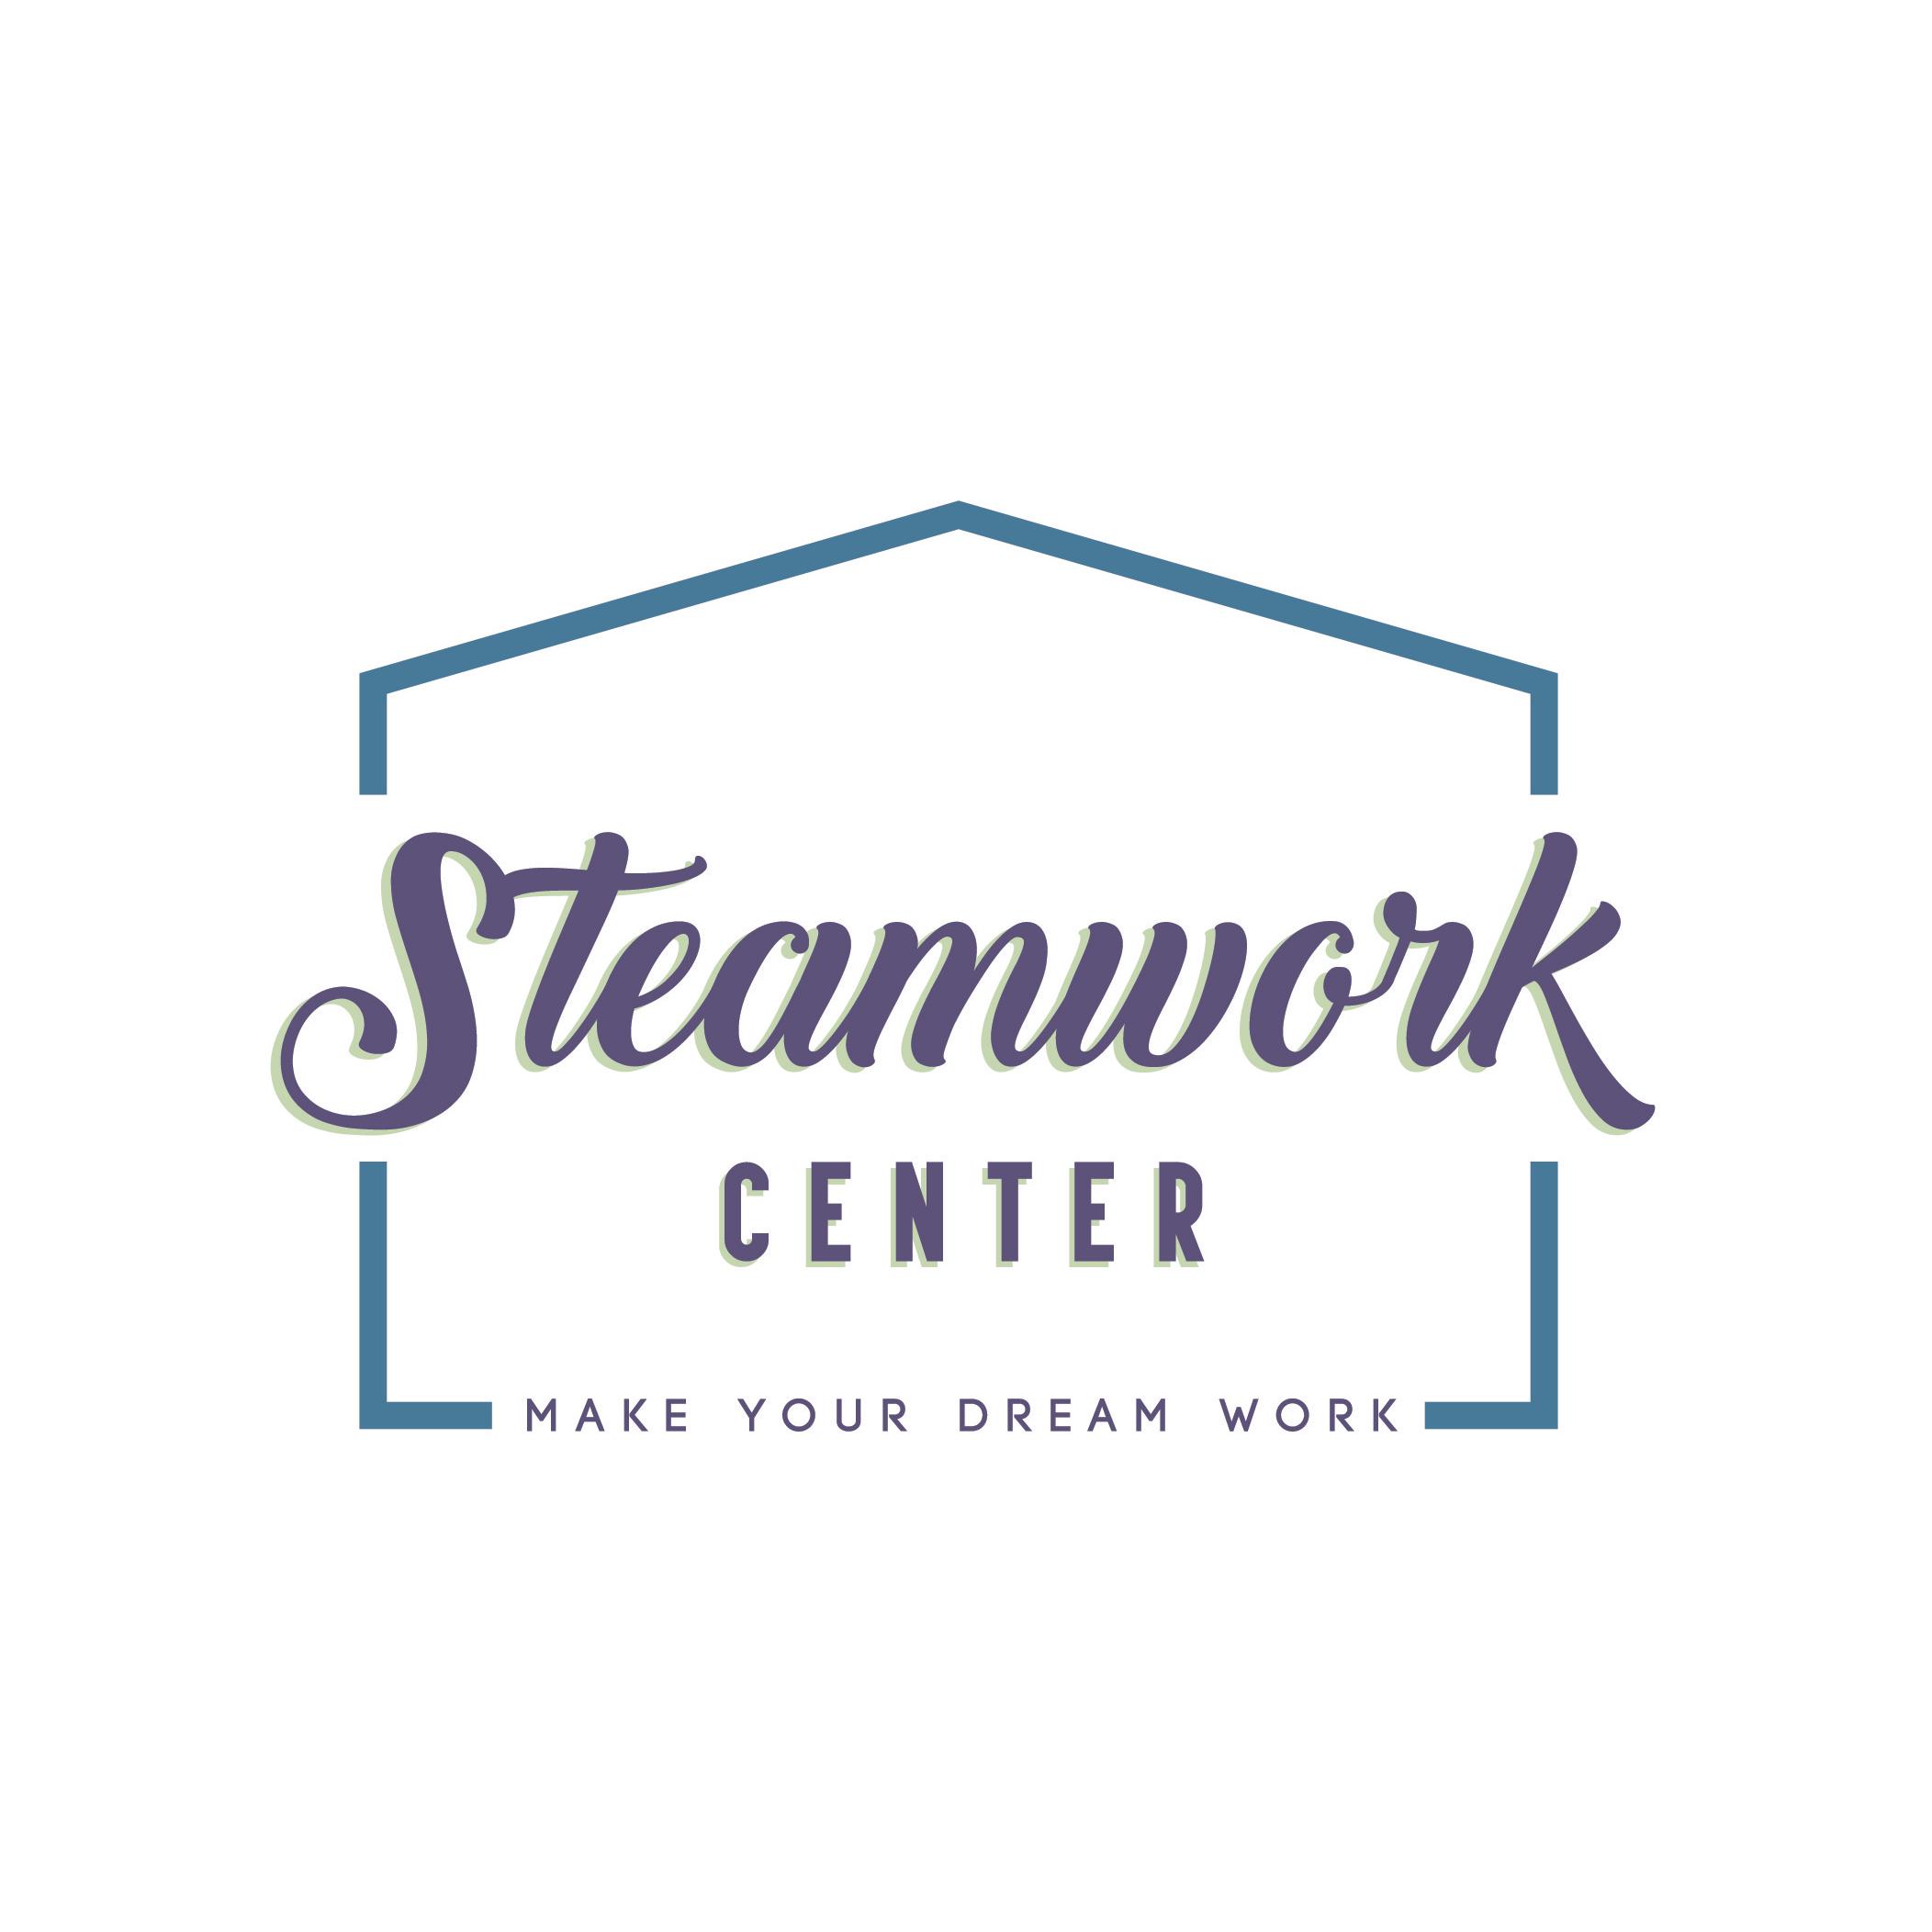 Steamwork Center - Santa Clarita, CA - Business & Secretarial